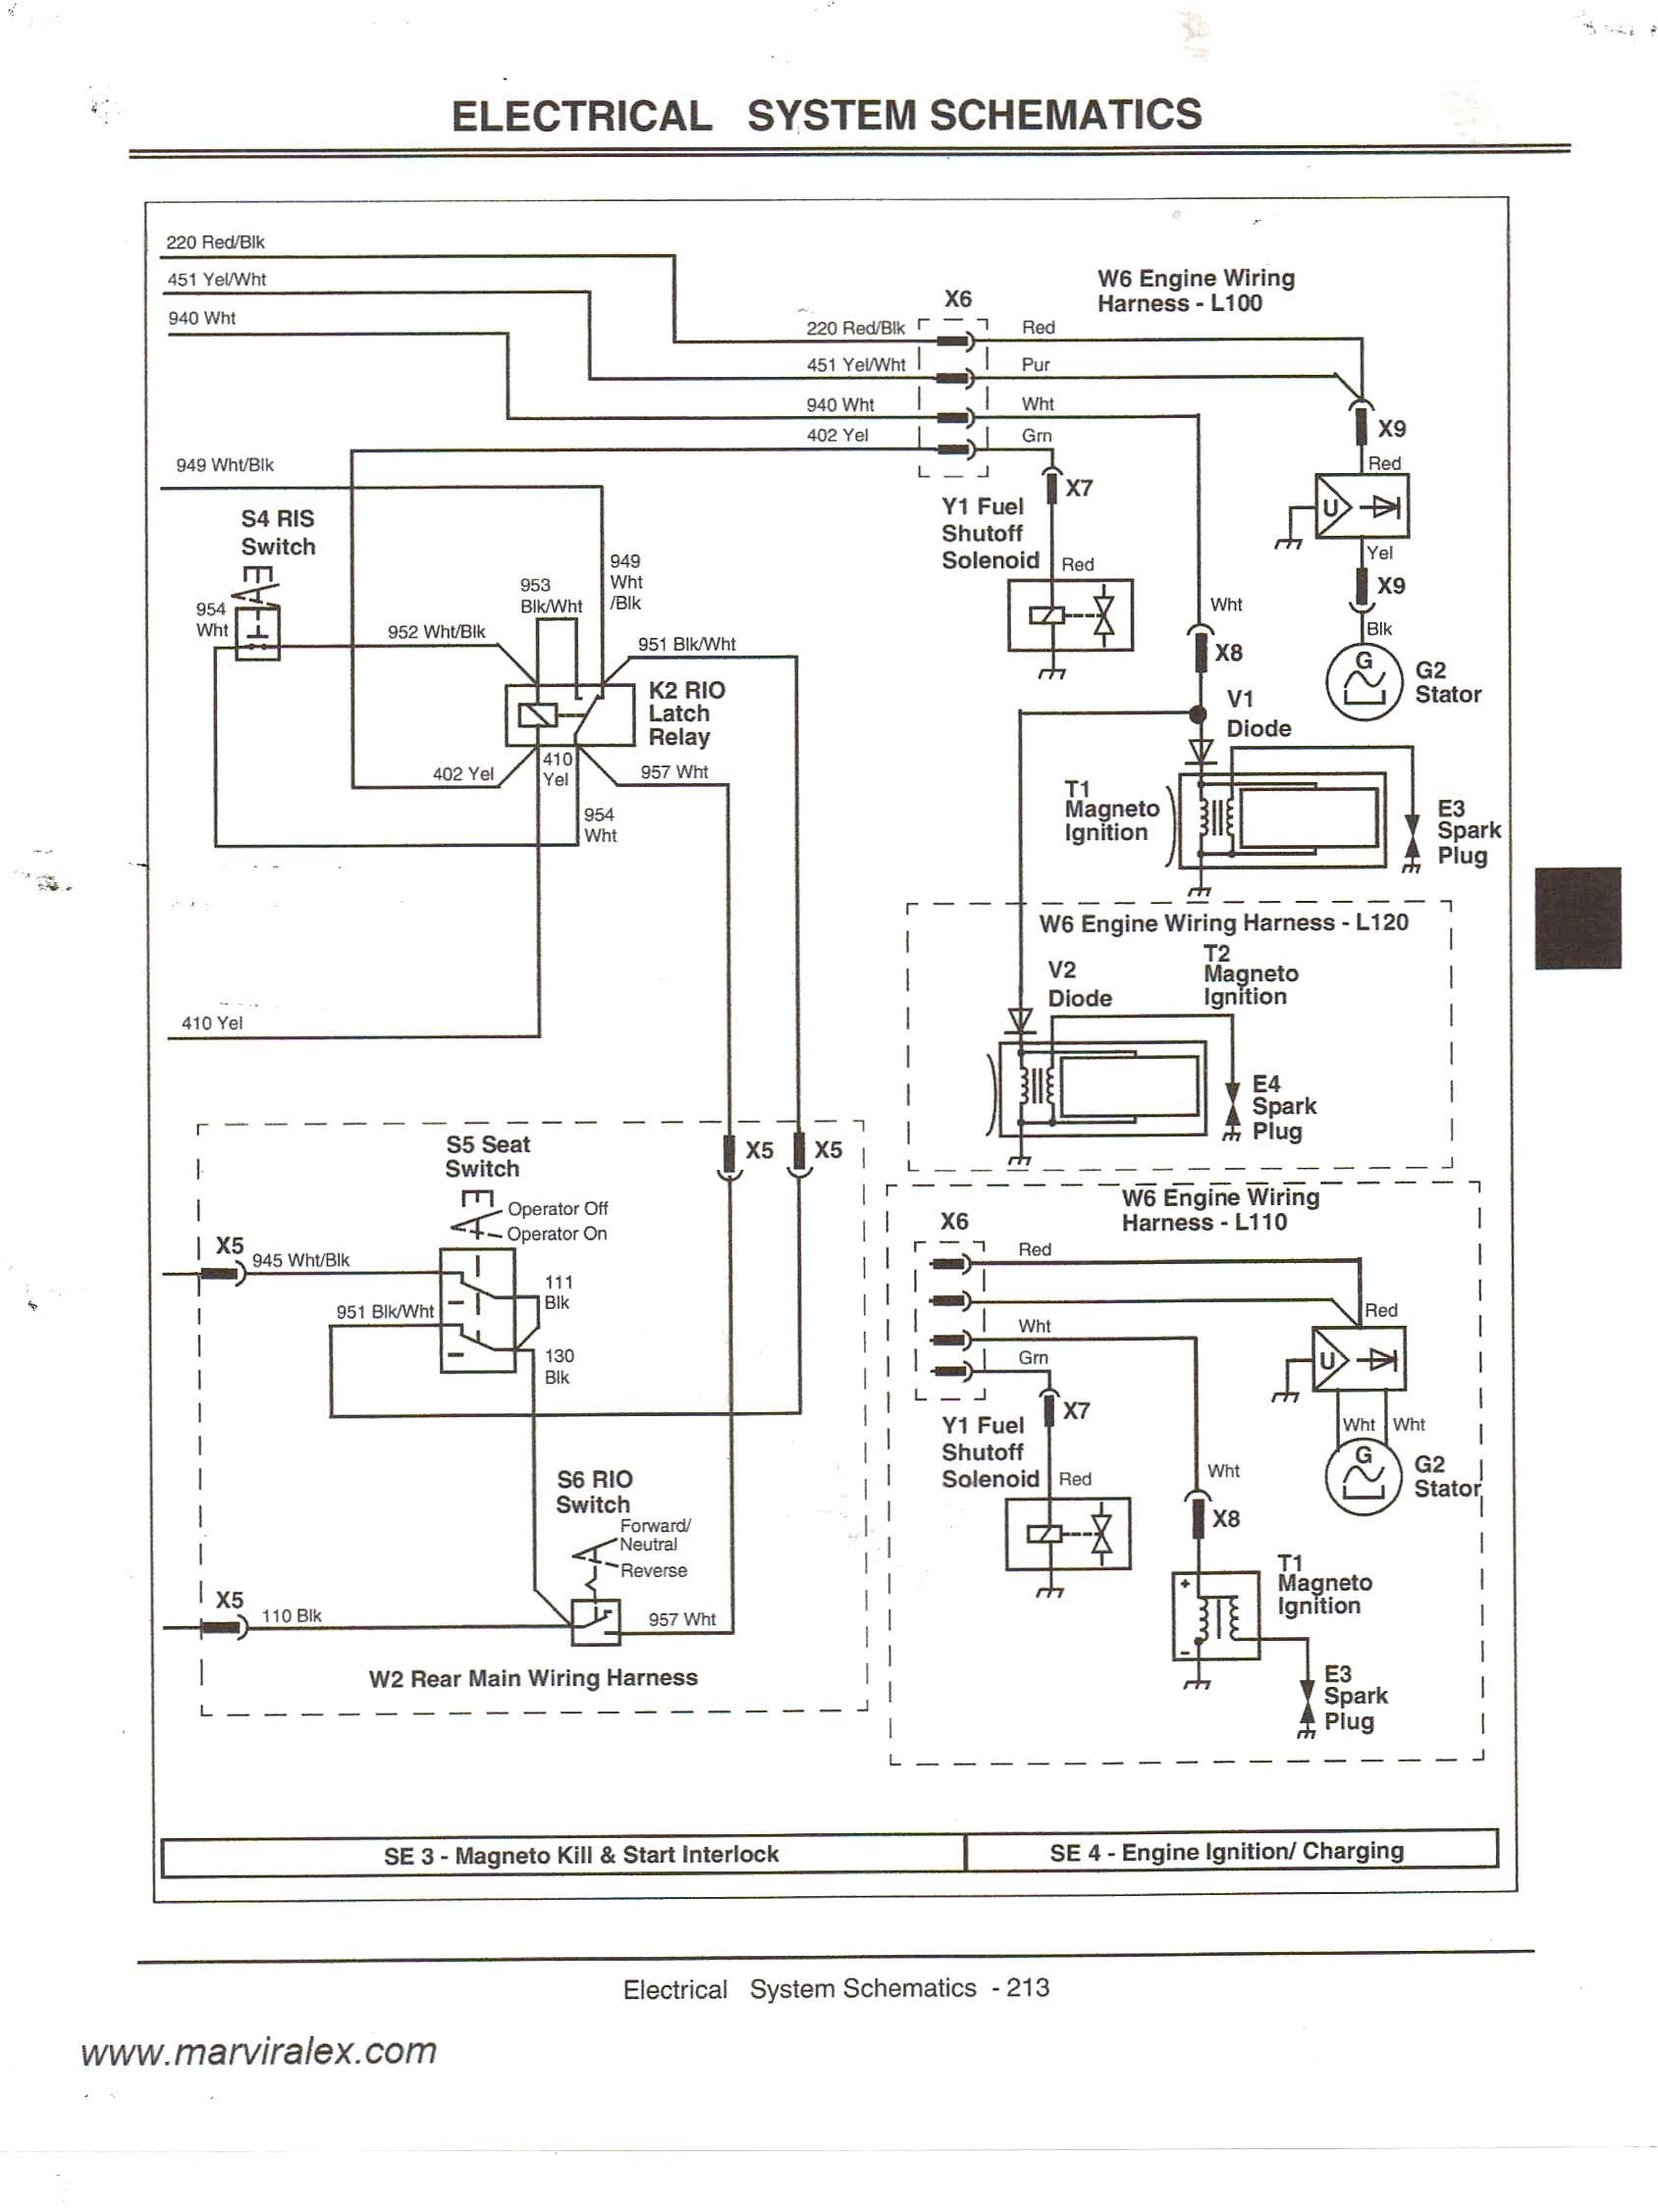 Lt155 Wiring Schematic   Manual E-Books - John Deere Lt155 Wiring Diagram